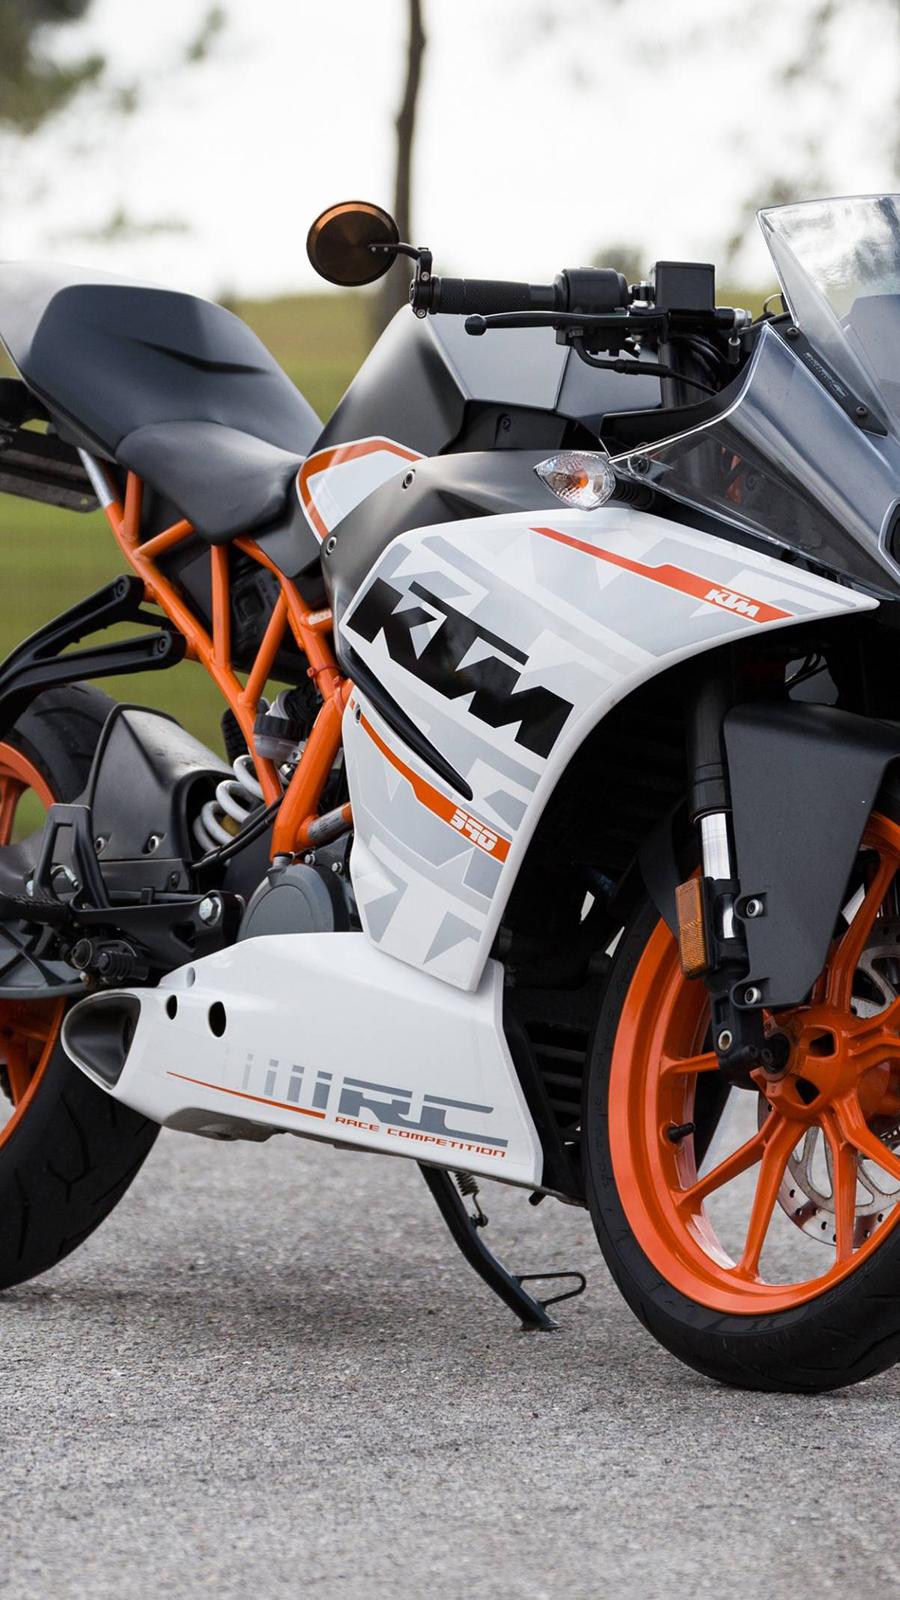 Most Popular Super Sport Bikes HD Wallpapers – Free Download (23)